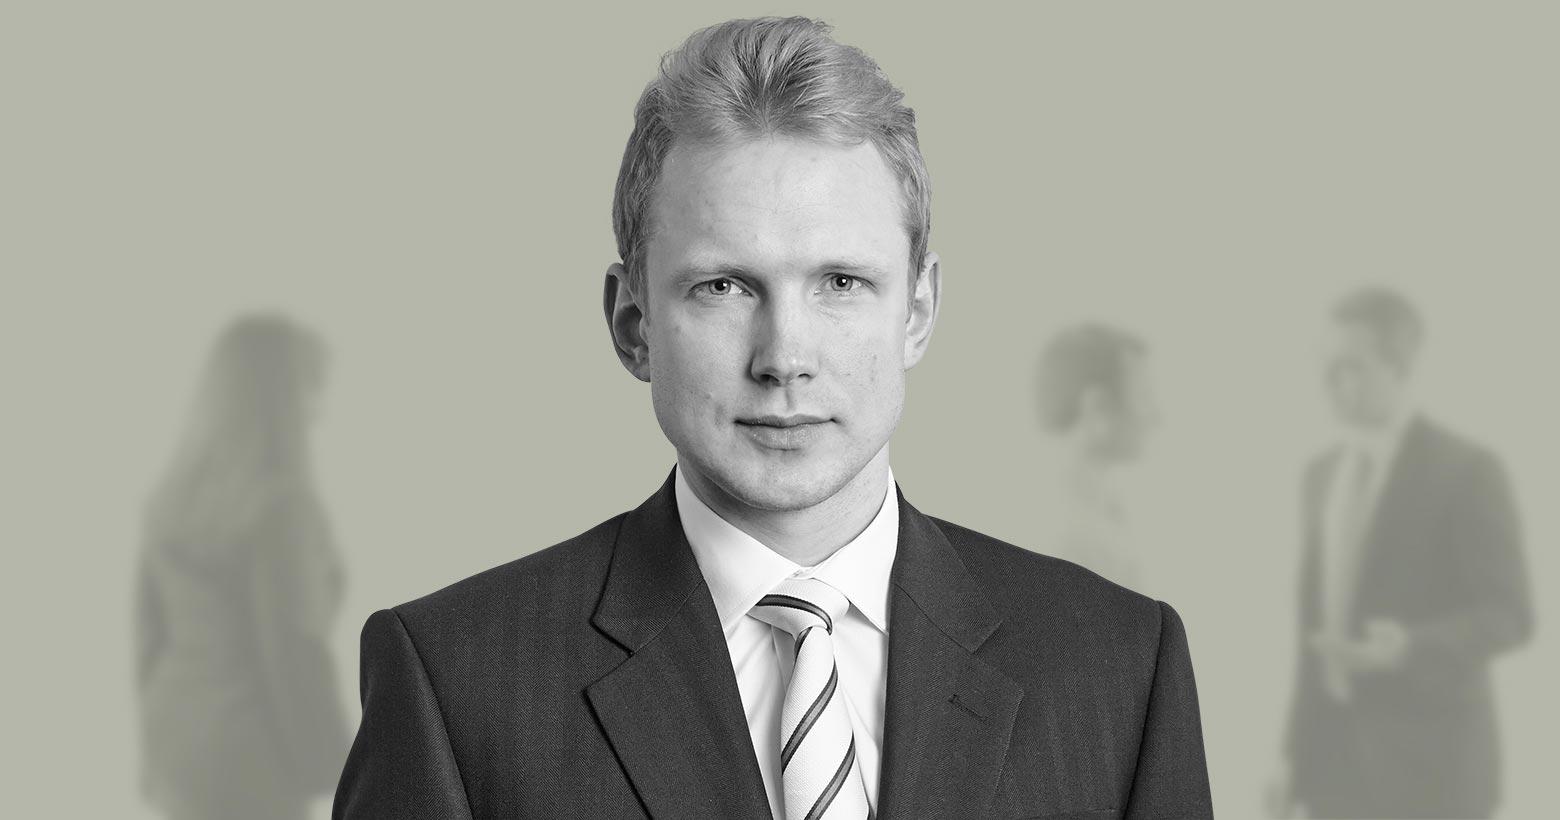 Daniel James Thomas Lloyd